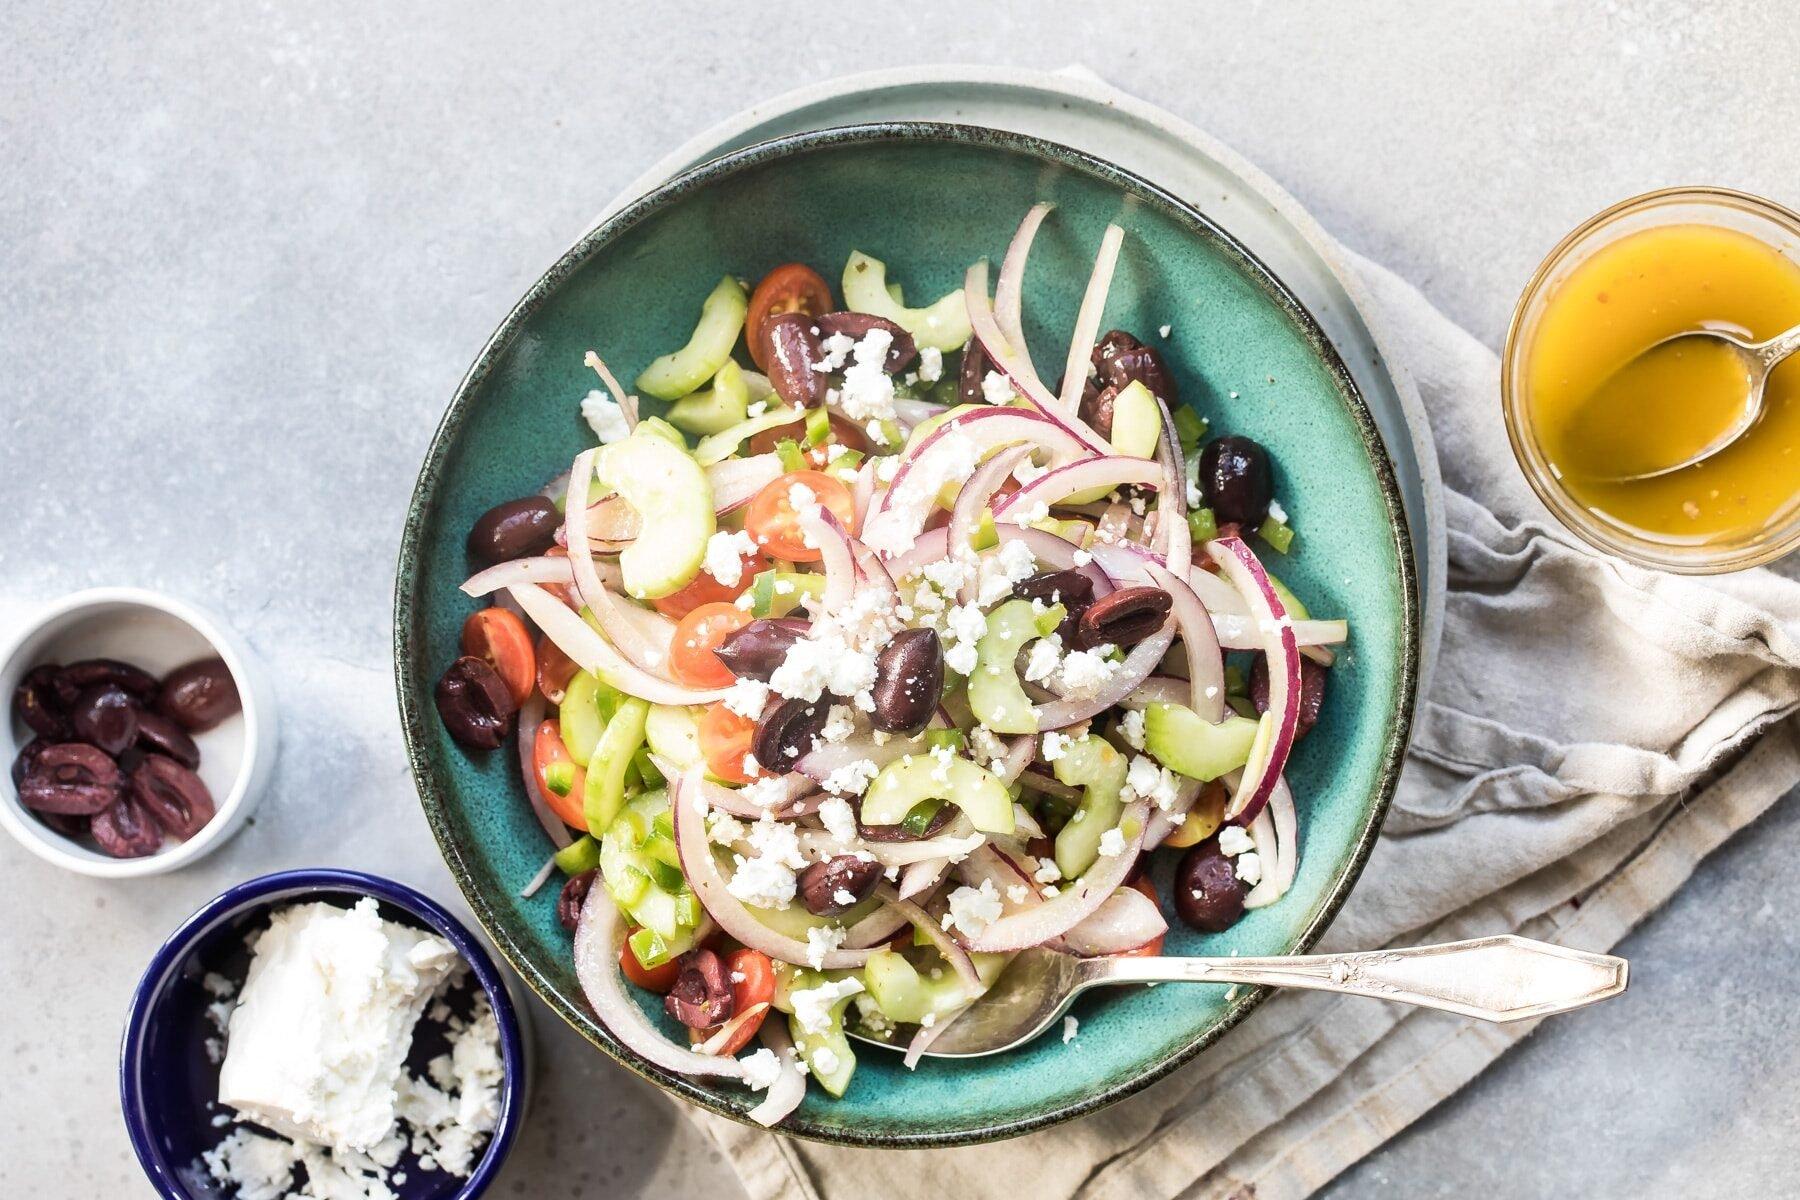 Greek salad in a blue bowl. .